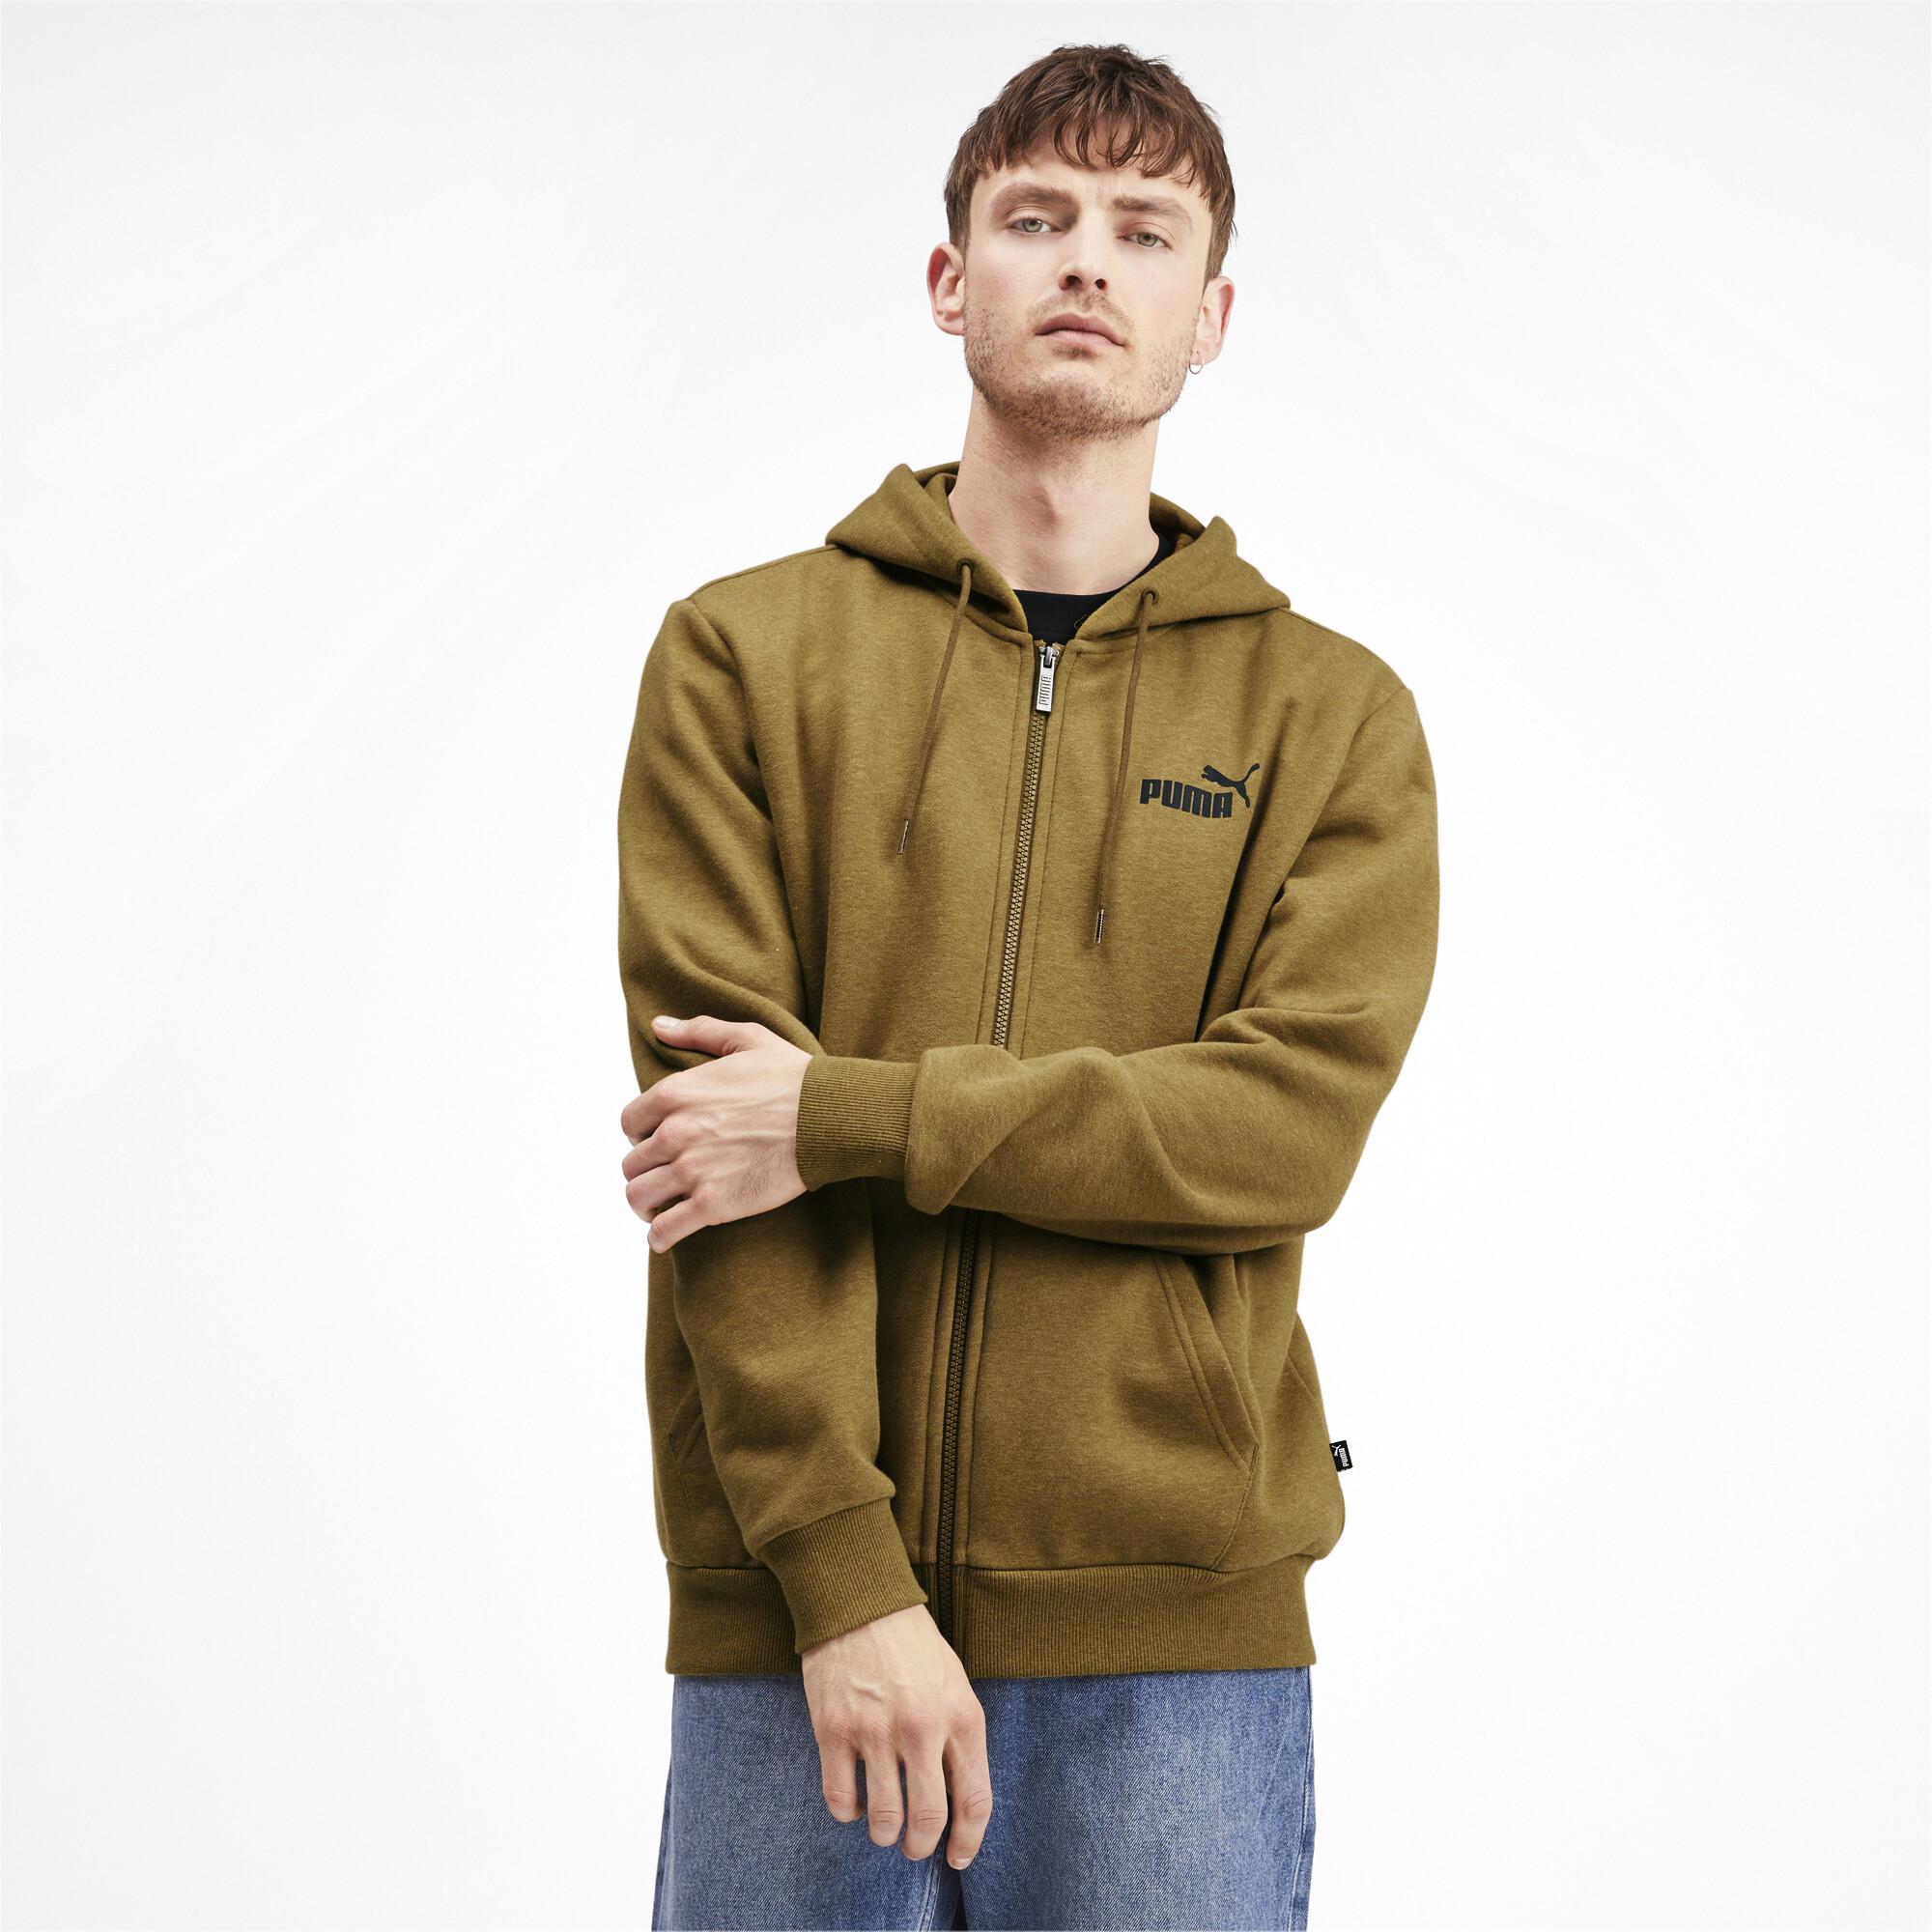 PUMA-Essentials-Men-039-s-Fleece-Hooded-Jacket-Men-Sweat-Basics thumbnail 22